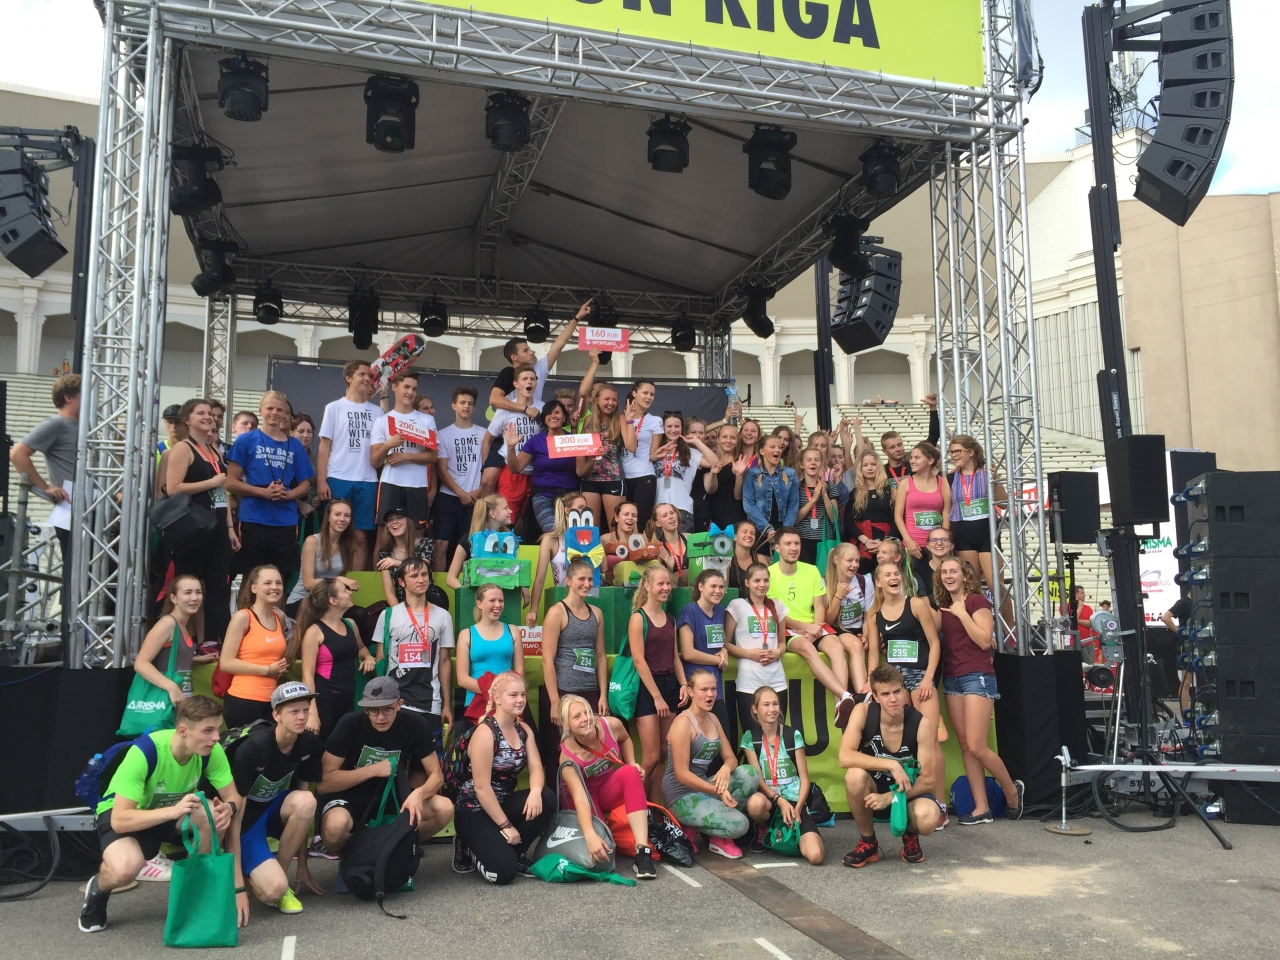 We Run Riga